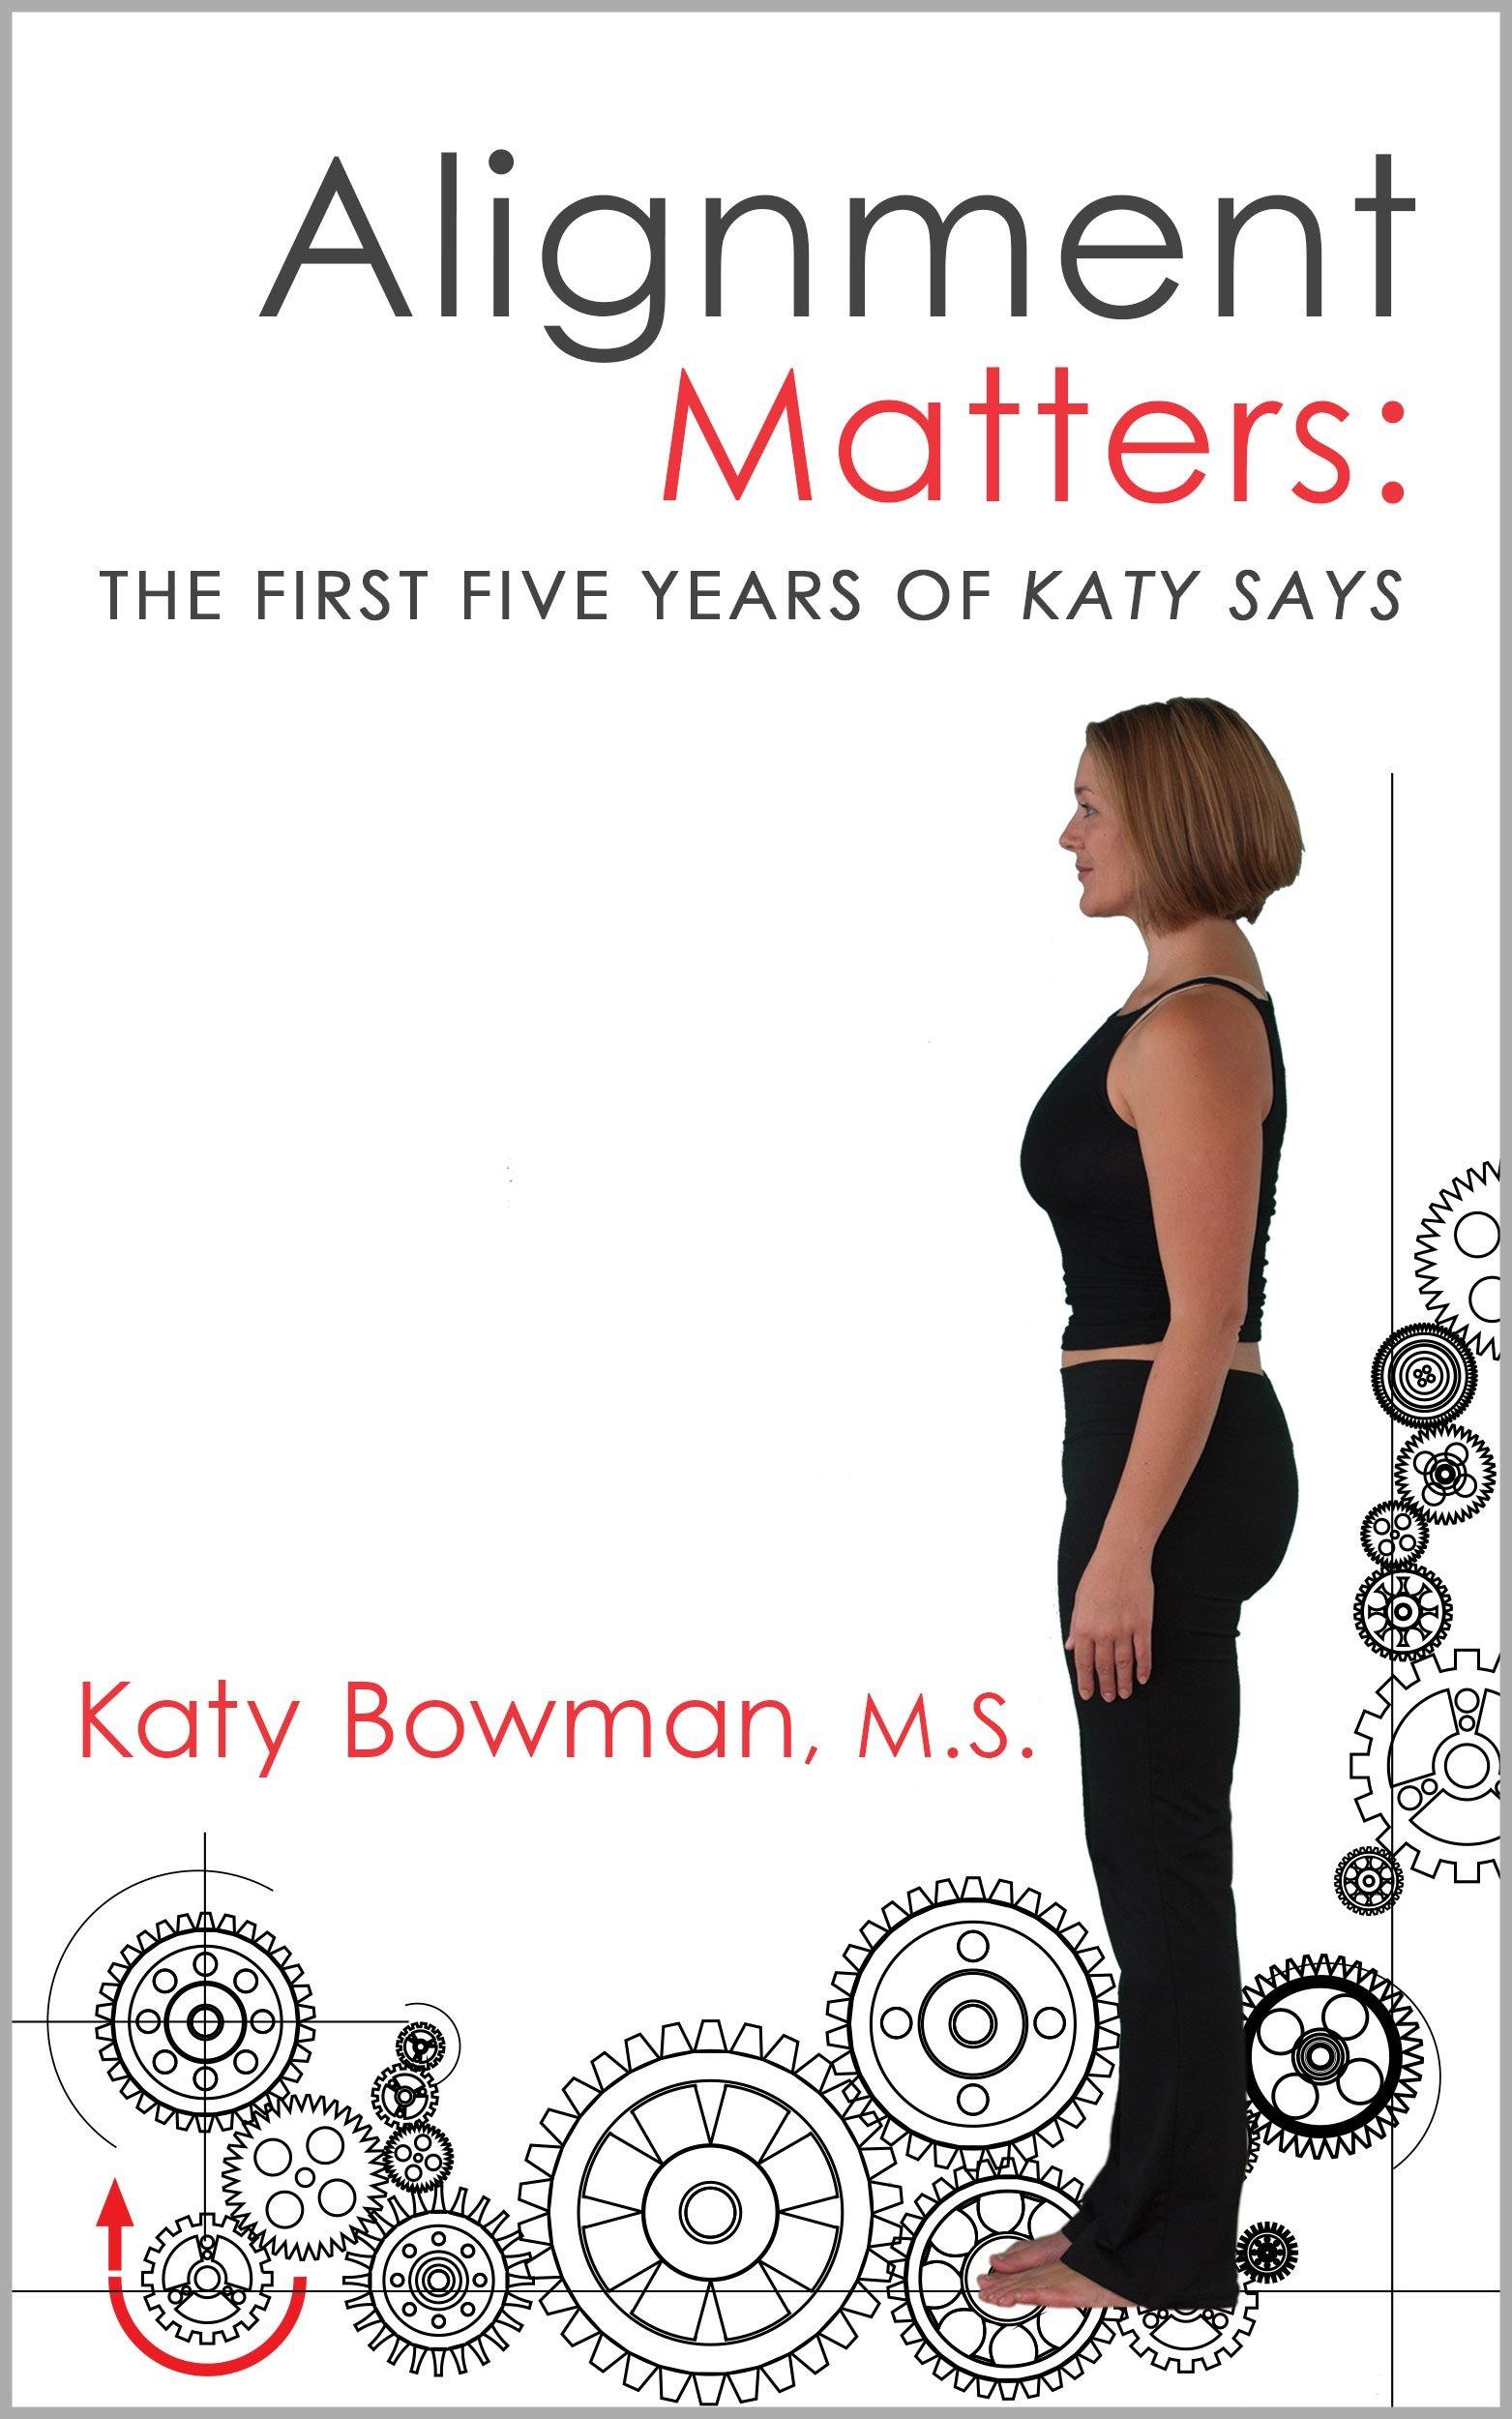 Alignment Matters (Katy Bowman)